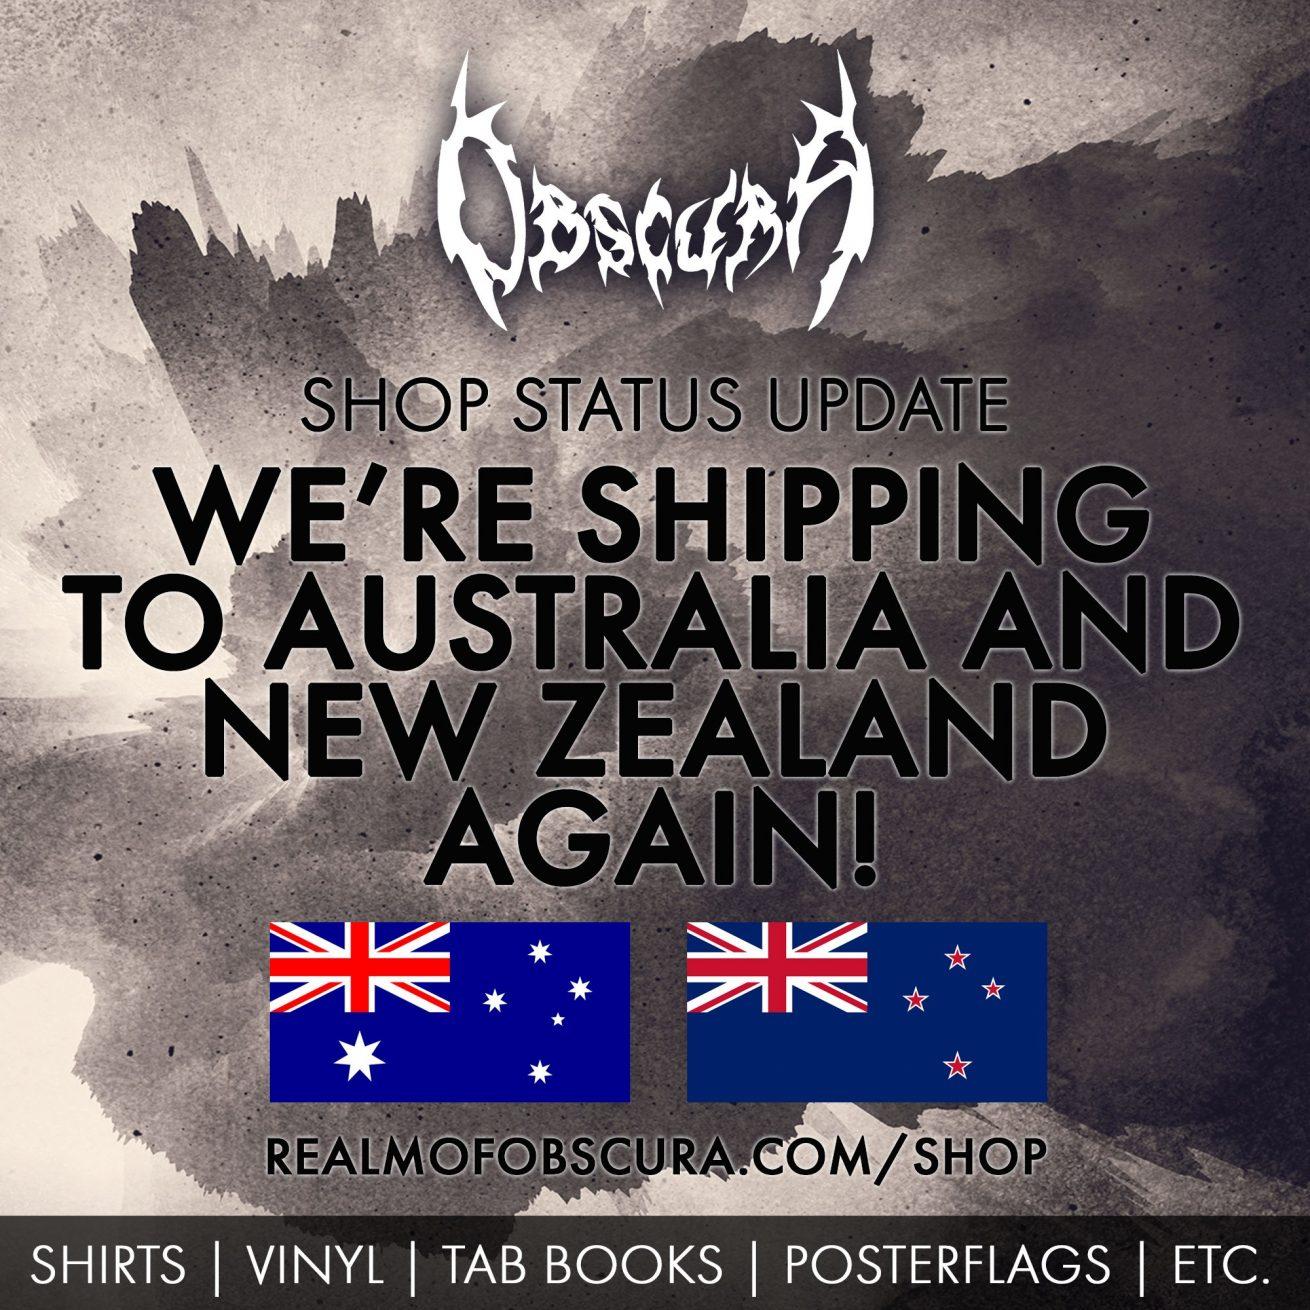 Obscura | Australia & New Zealand Shipping